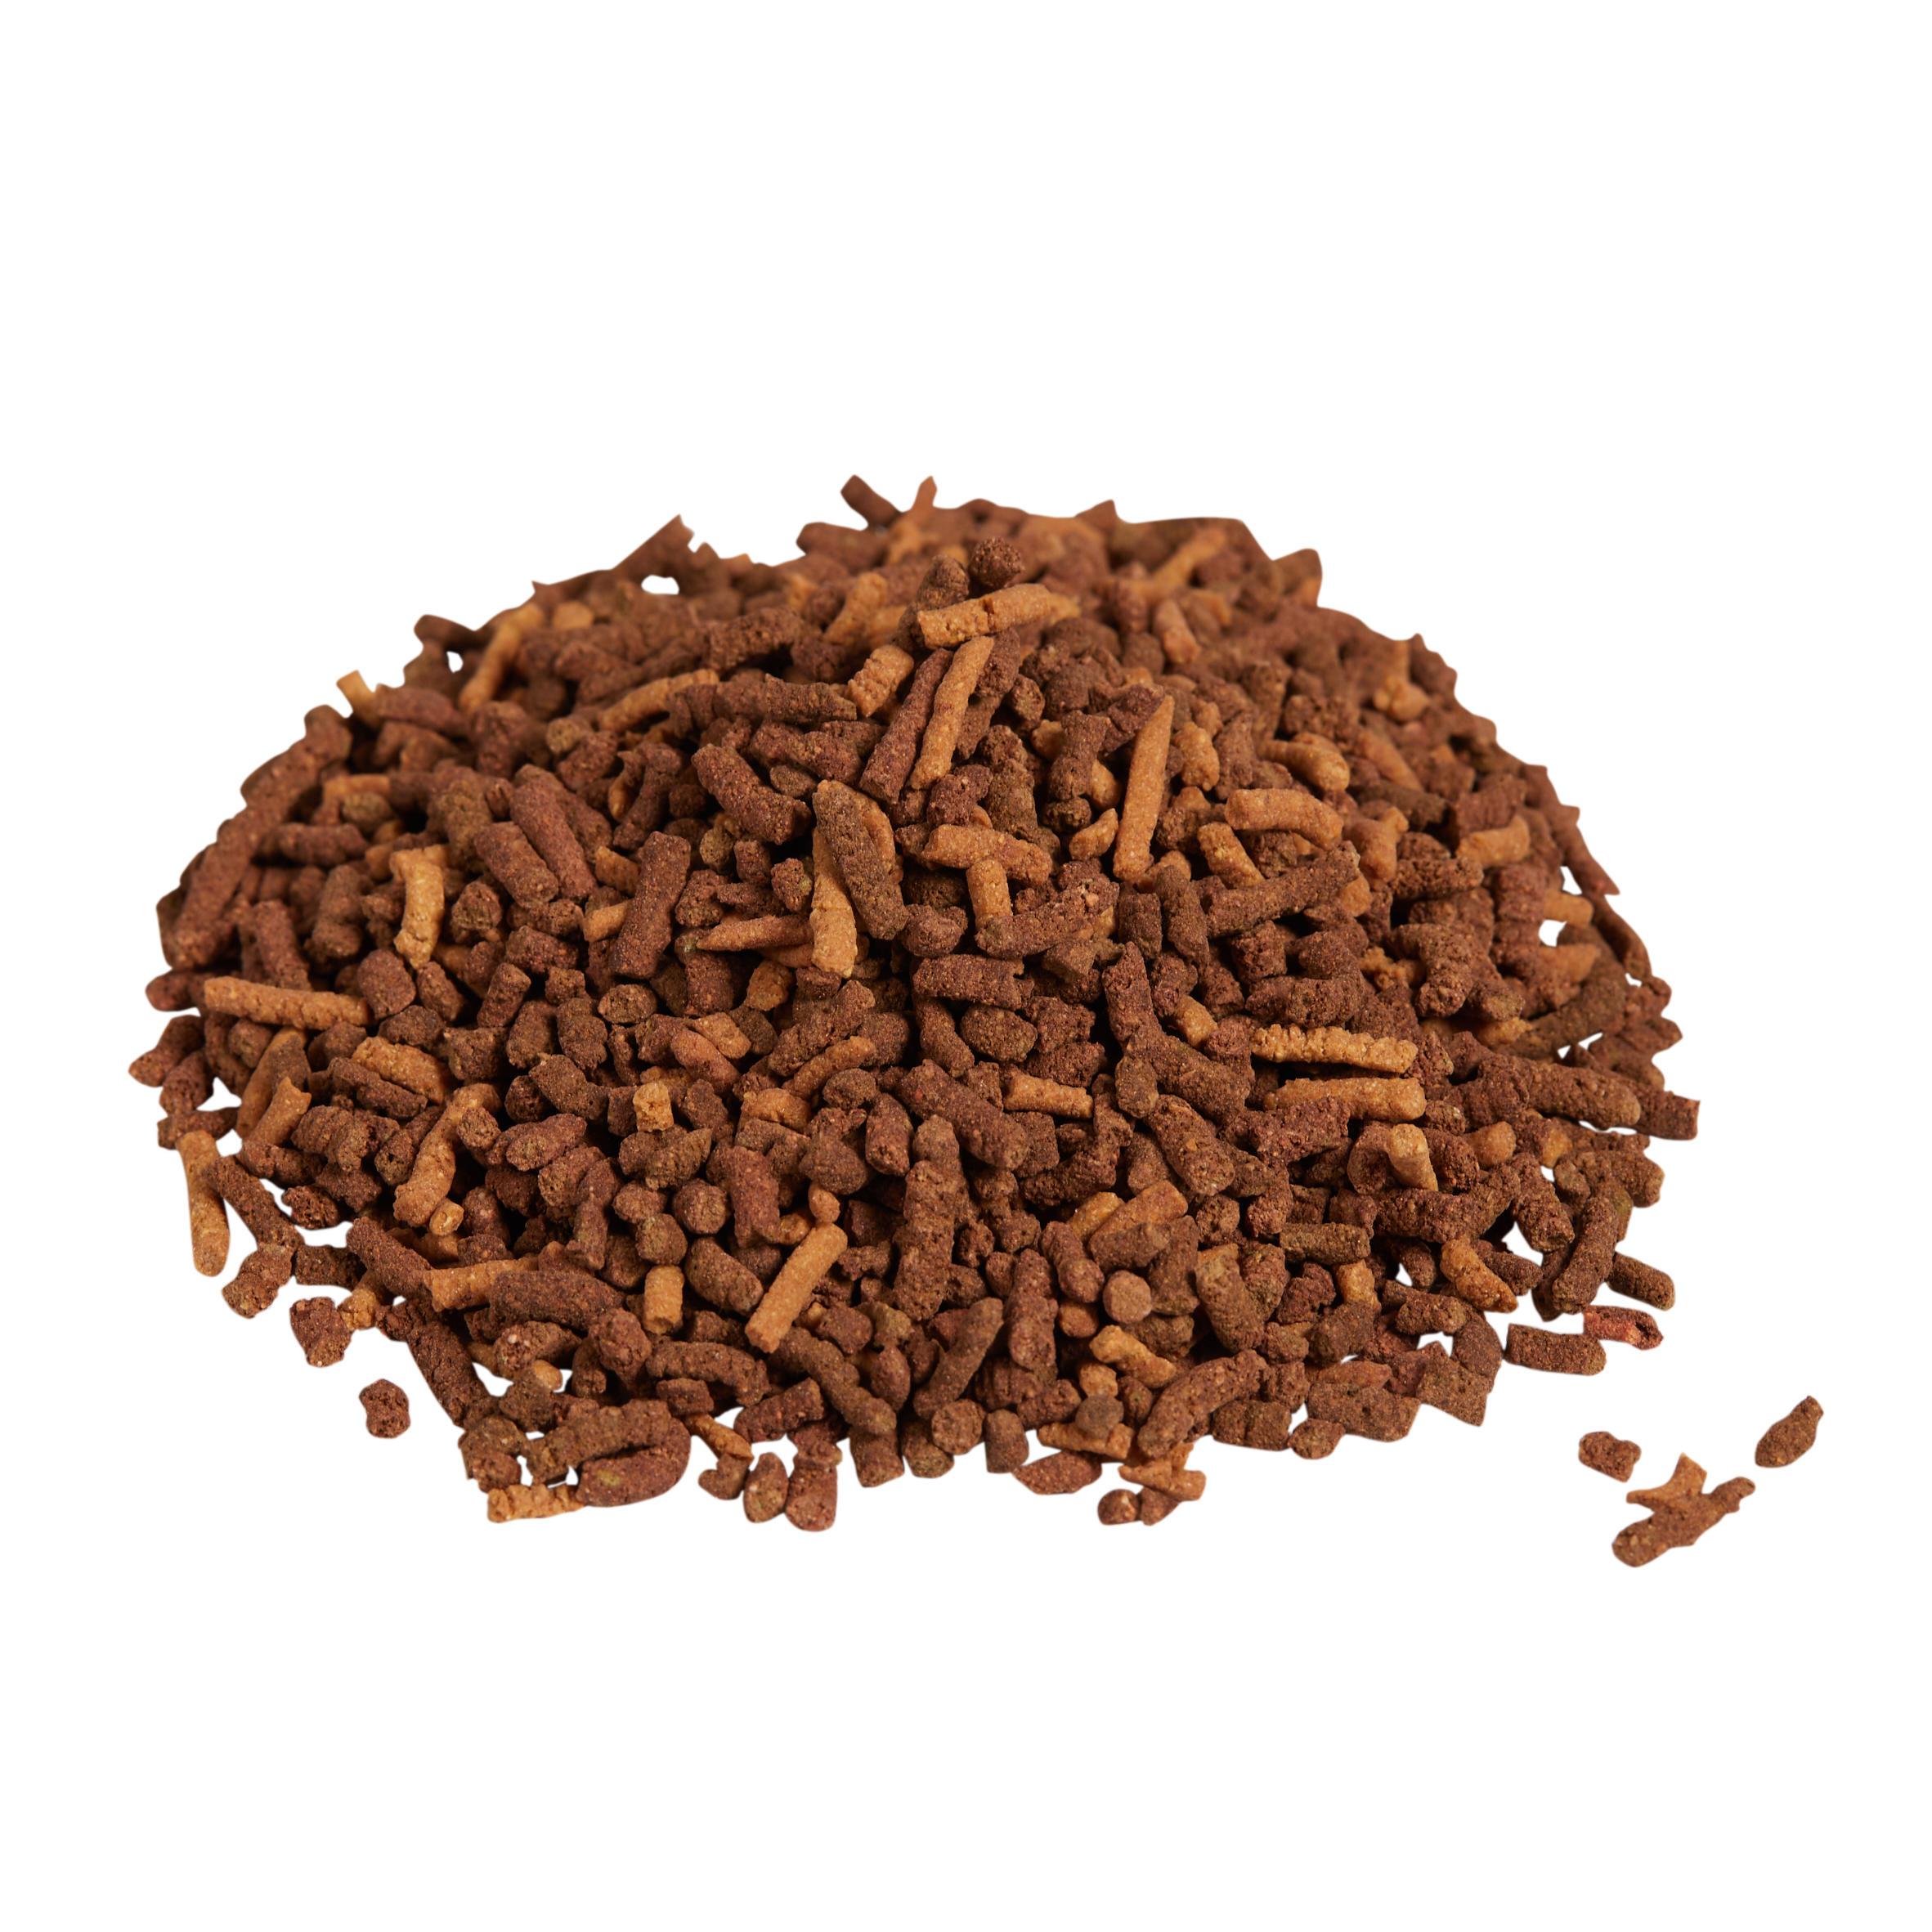 Multivitamin Horse Dietary Supplement 900 g